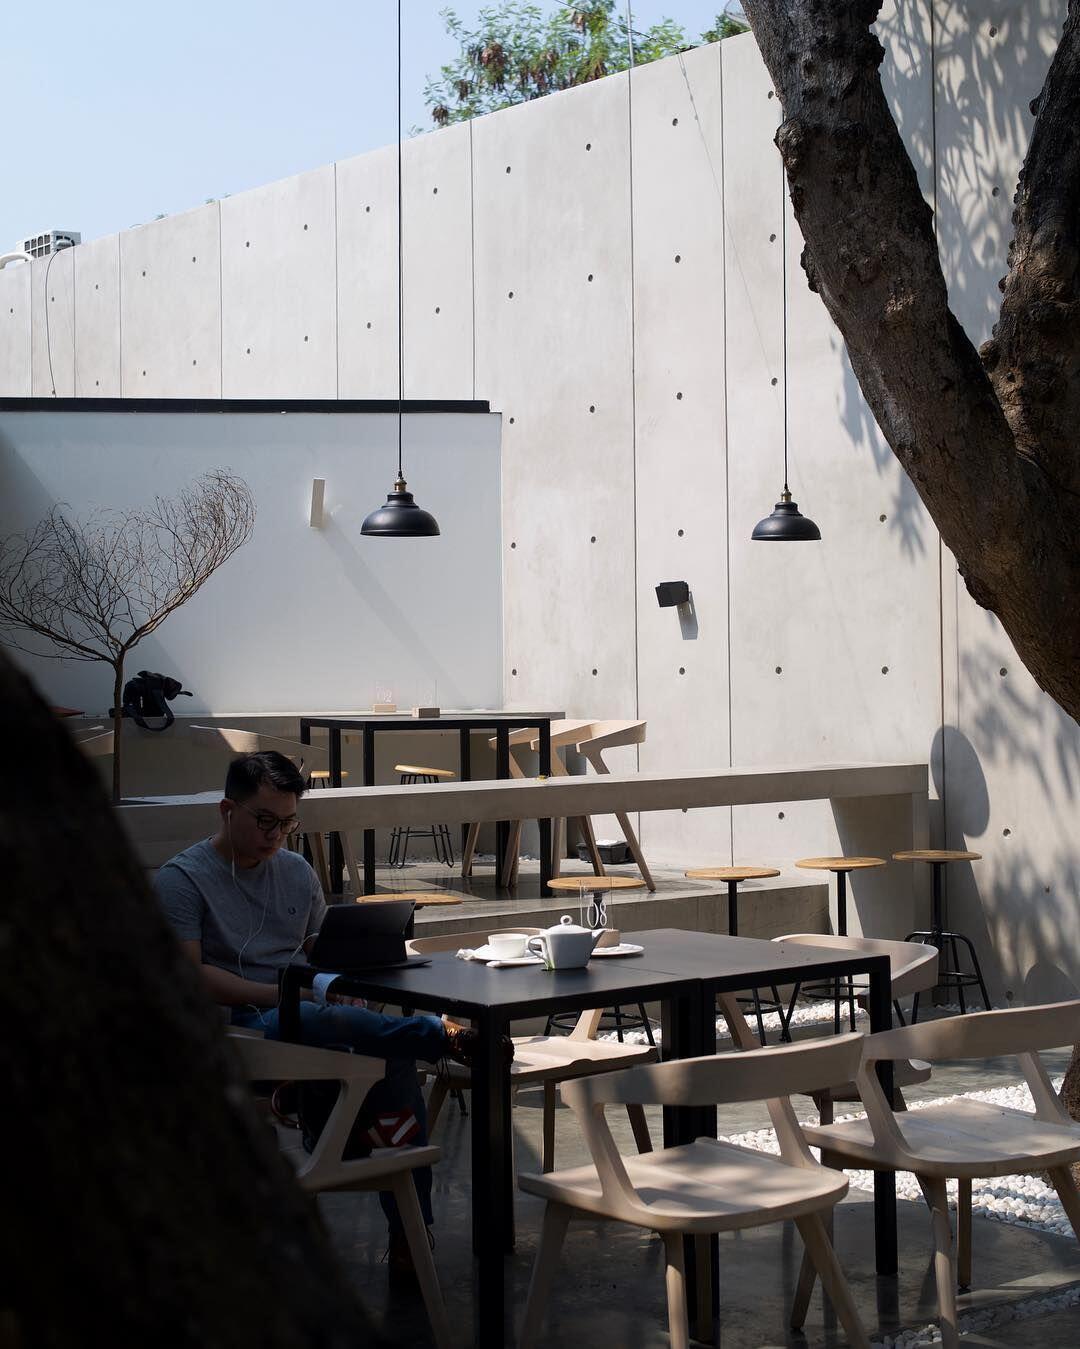 5 Cafe di Semarang yang Instagramable Banget, Wajib Didatangi Deh!